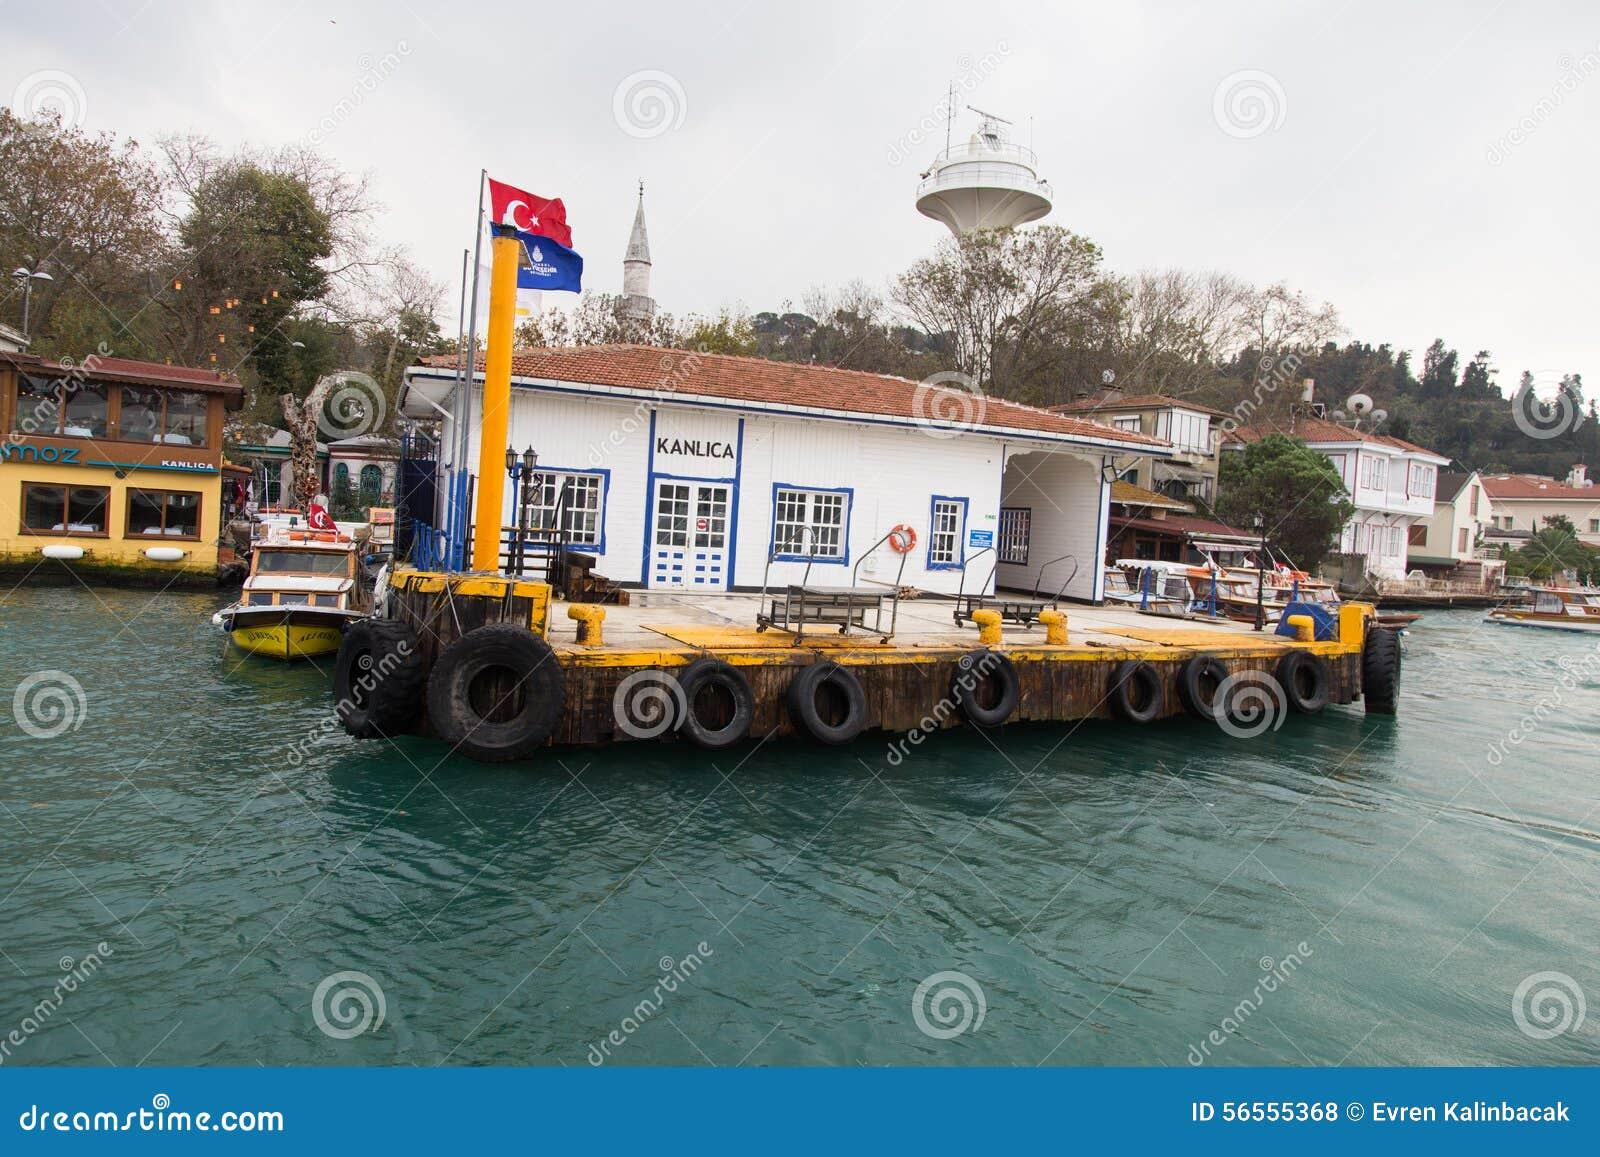 Download Λιμένας πορθμείων Kanlica εκδοτική στοκ εικόνες. εικόνα από επιβάτης - 56555368